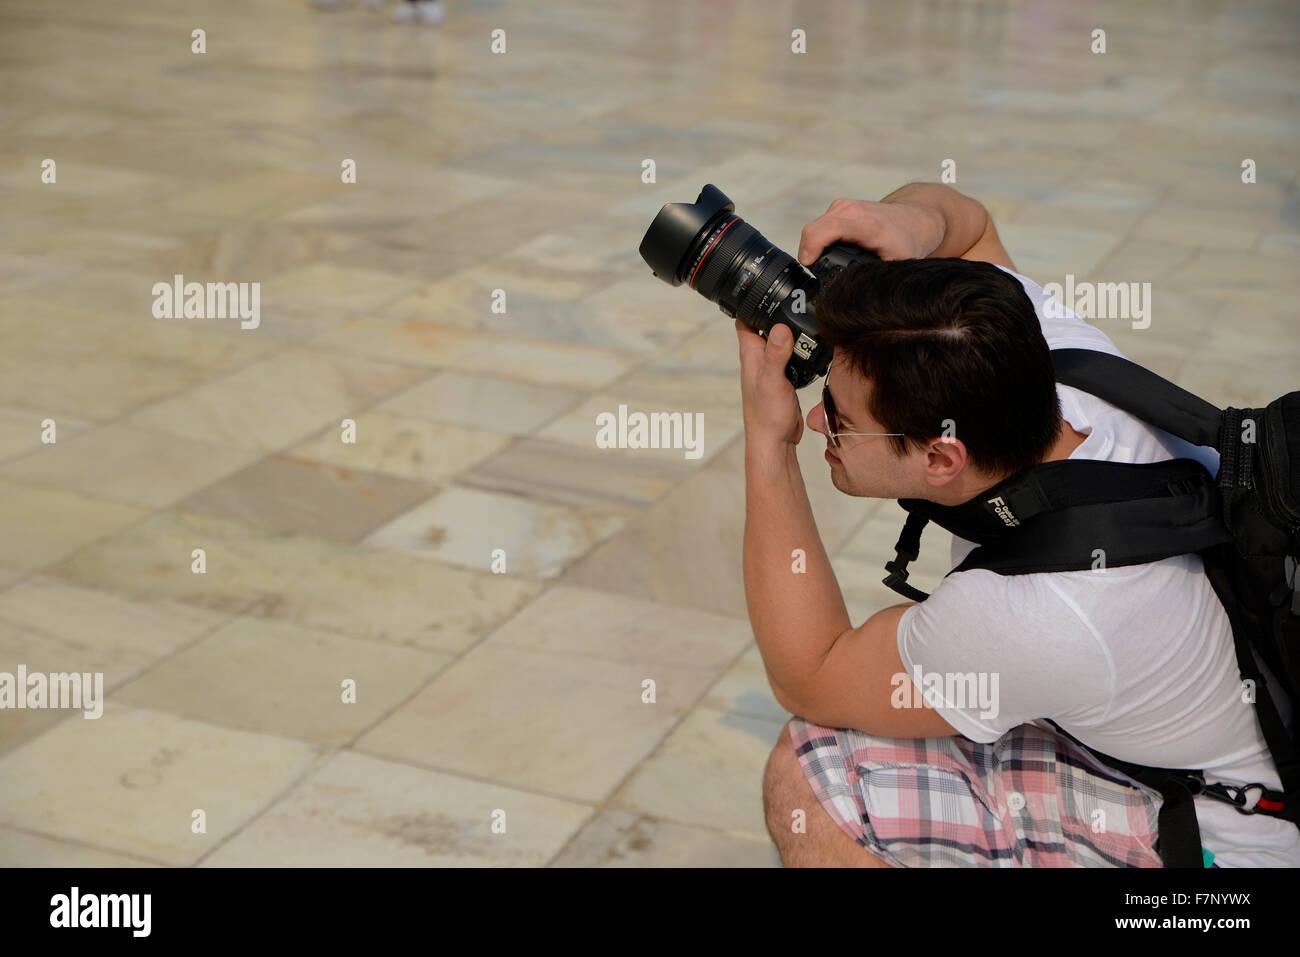 Touristen-Fotografen der Aufnahme des Taj Mahal Architektur Stockbild